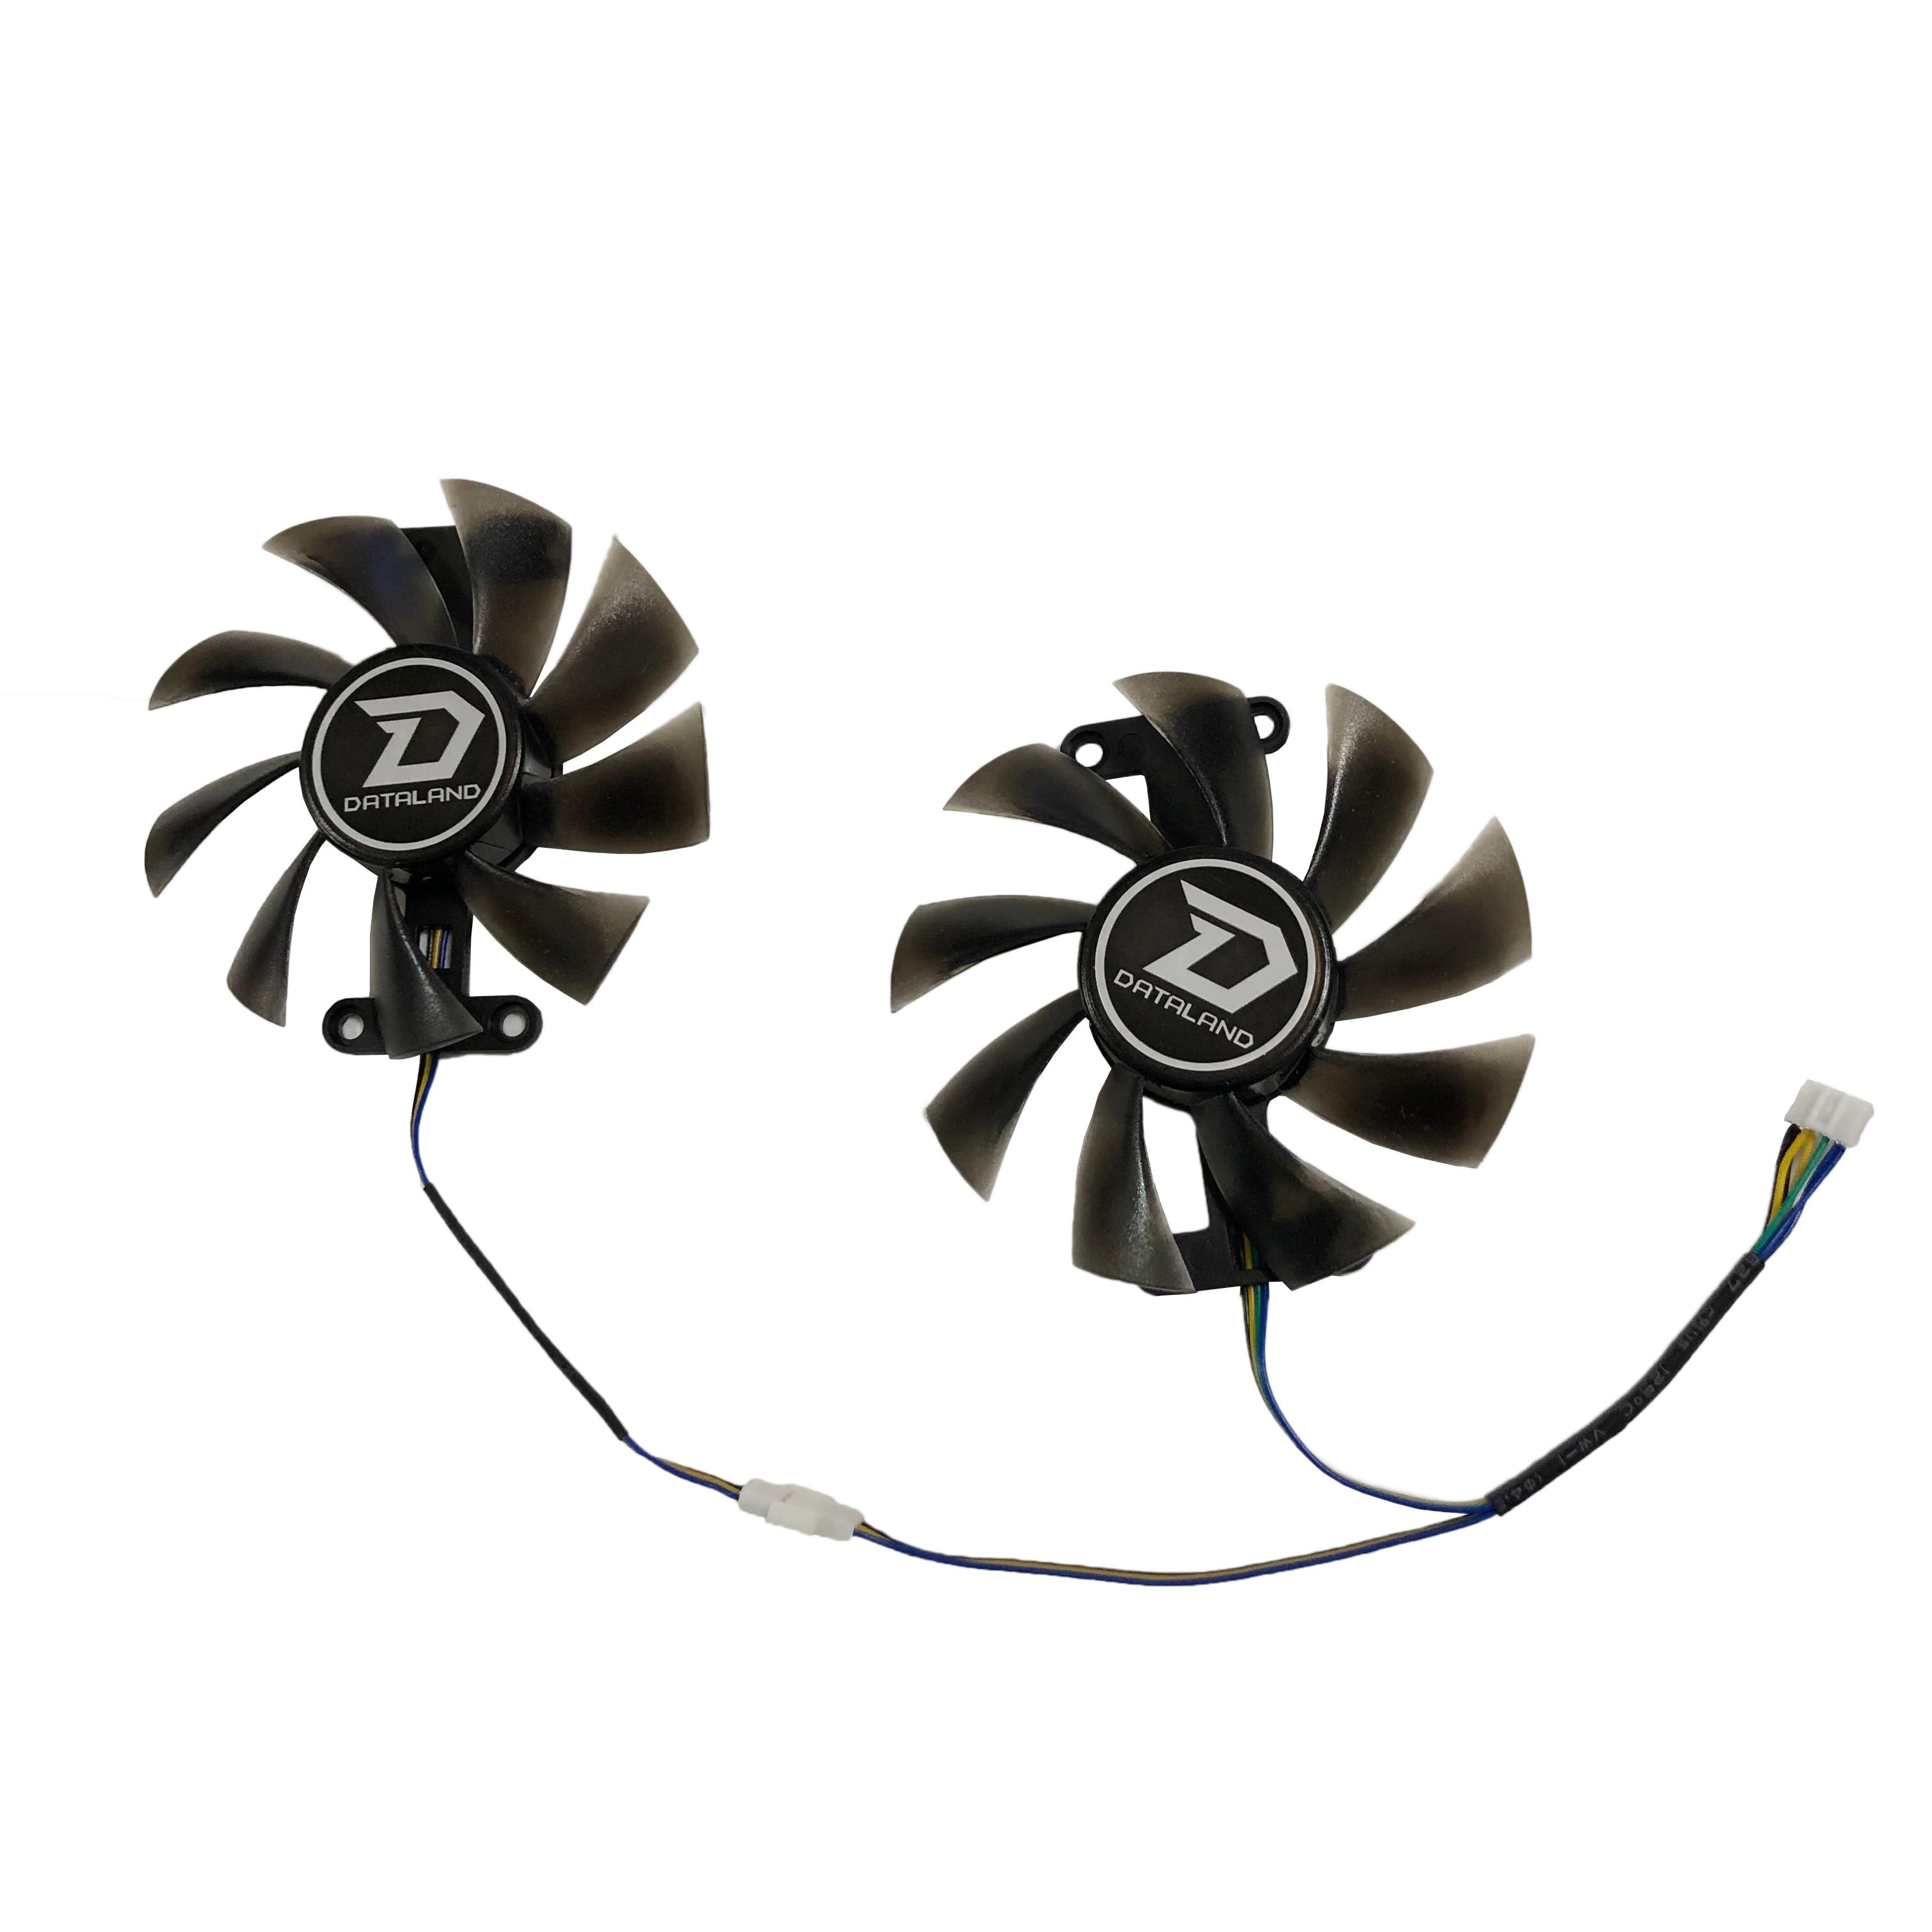 2 Teile/satz PLA09215B12H PowerColor Rot Teufel RX 480 470 580 GPU Kühler Fan Für Red Dragon AX RX470 RX480 RX580 video Karten Kühlung